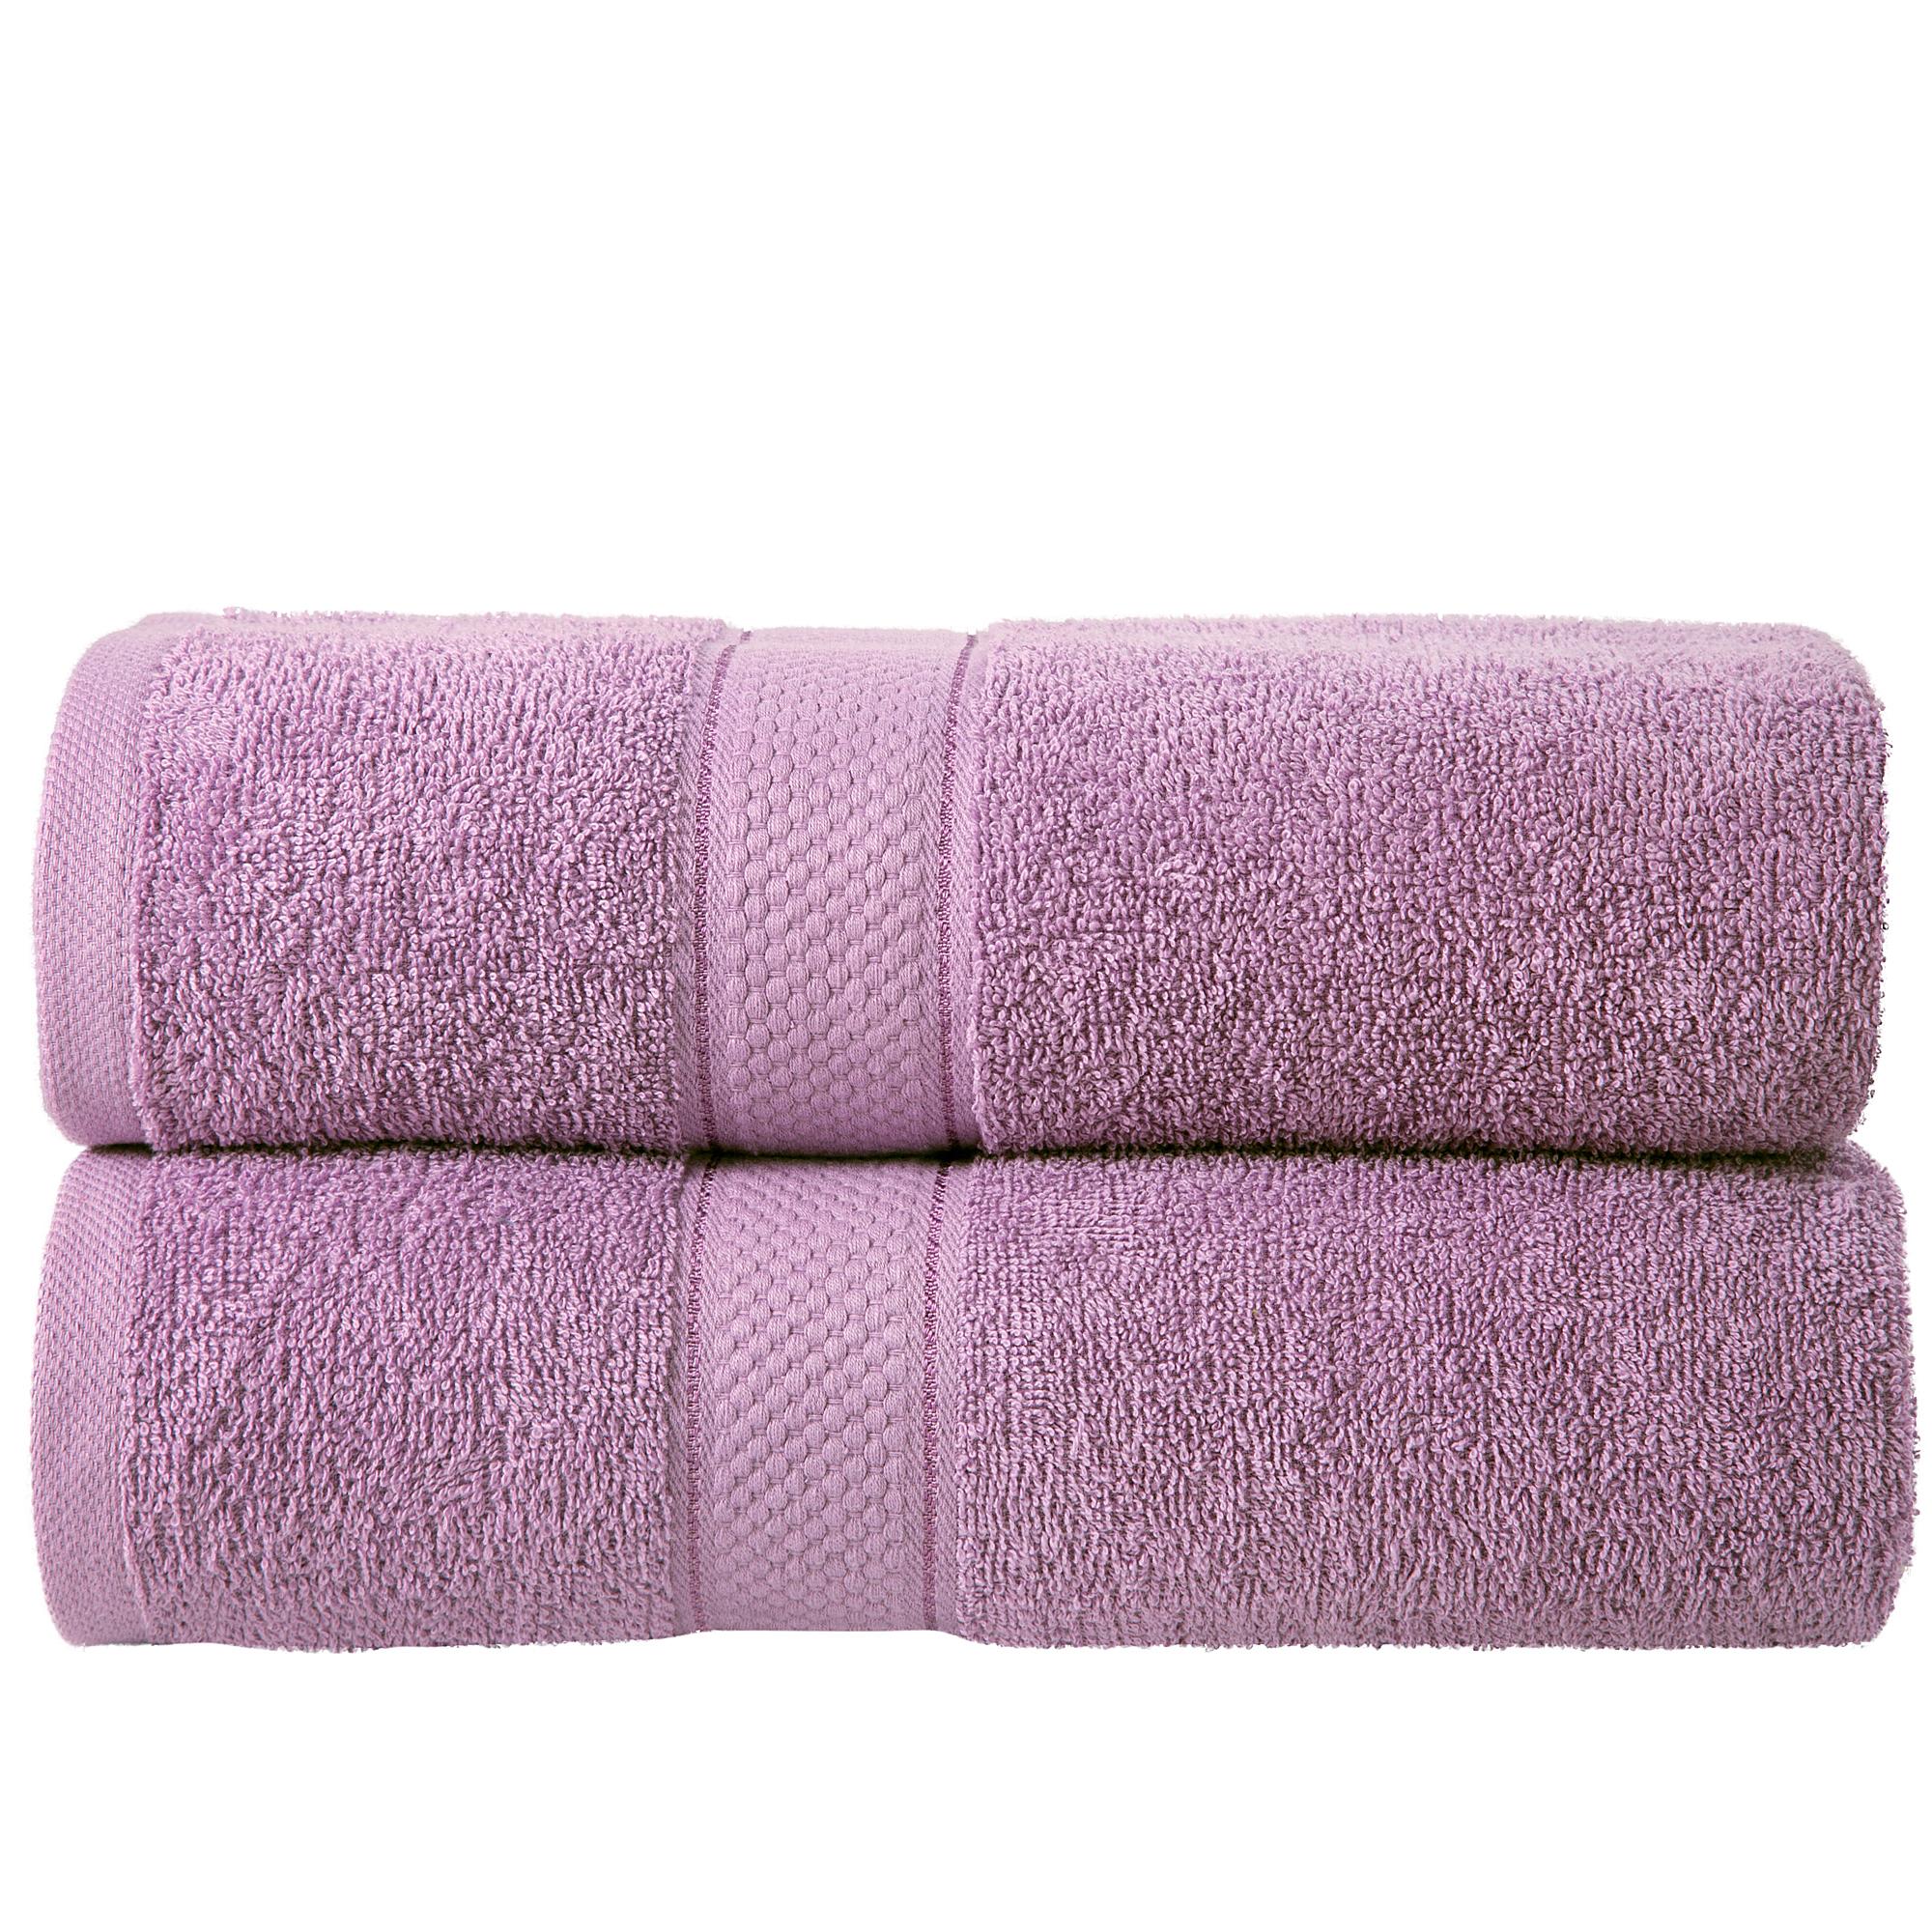 2 Pcs 100 % Cotton Premium Bath Sheet Towel Bale Set Lilac Plain